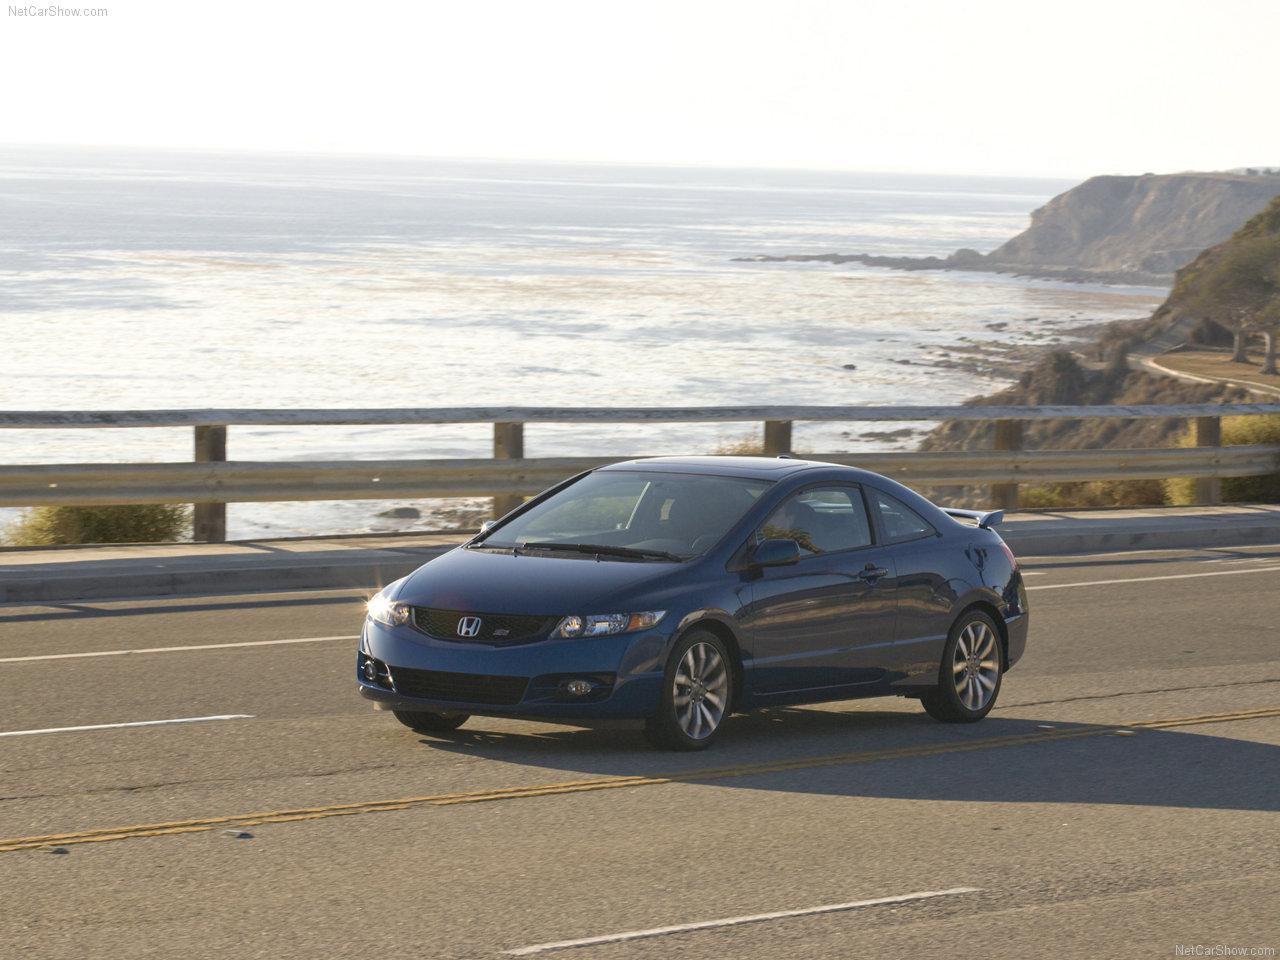 Honda   Populaire francais dautomobiles 2009 Honda Civic Si Coupe 1280x960